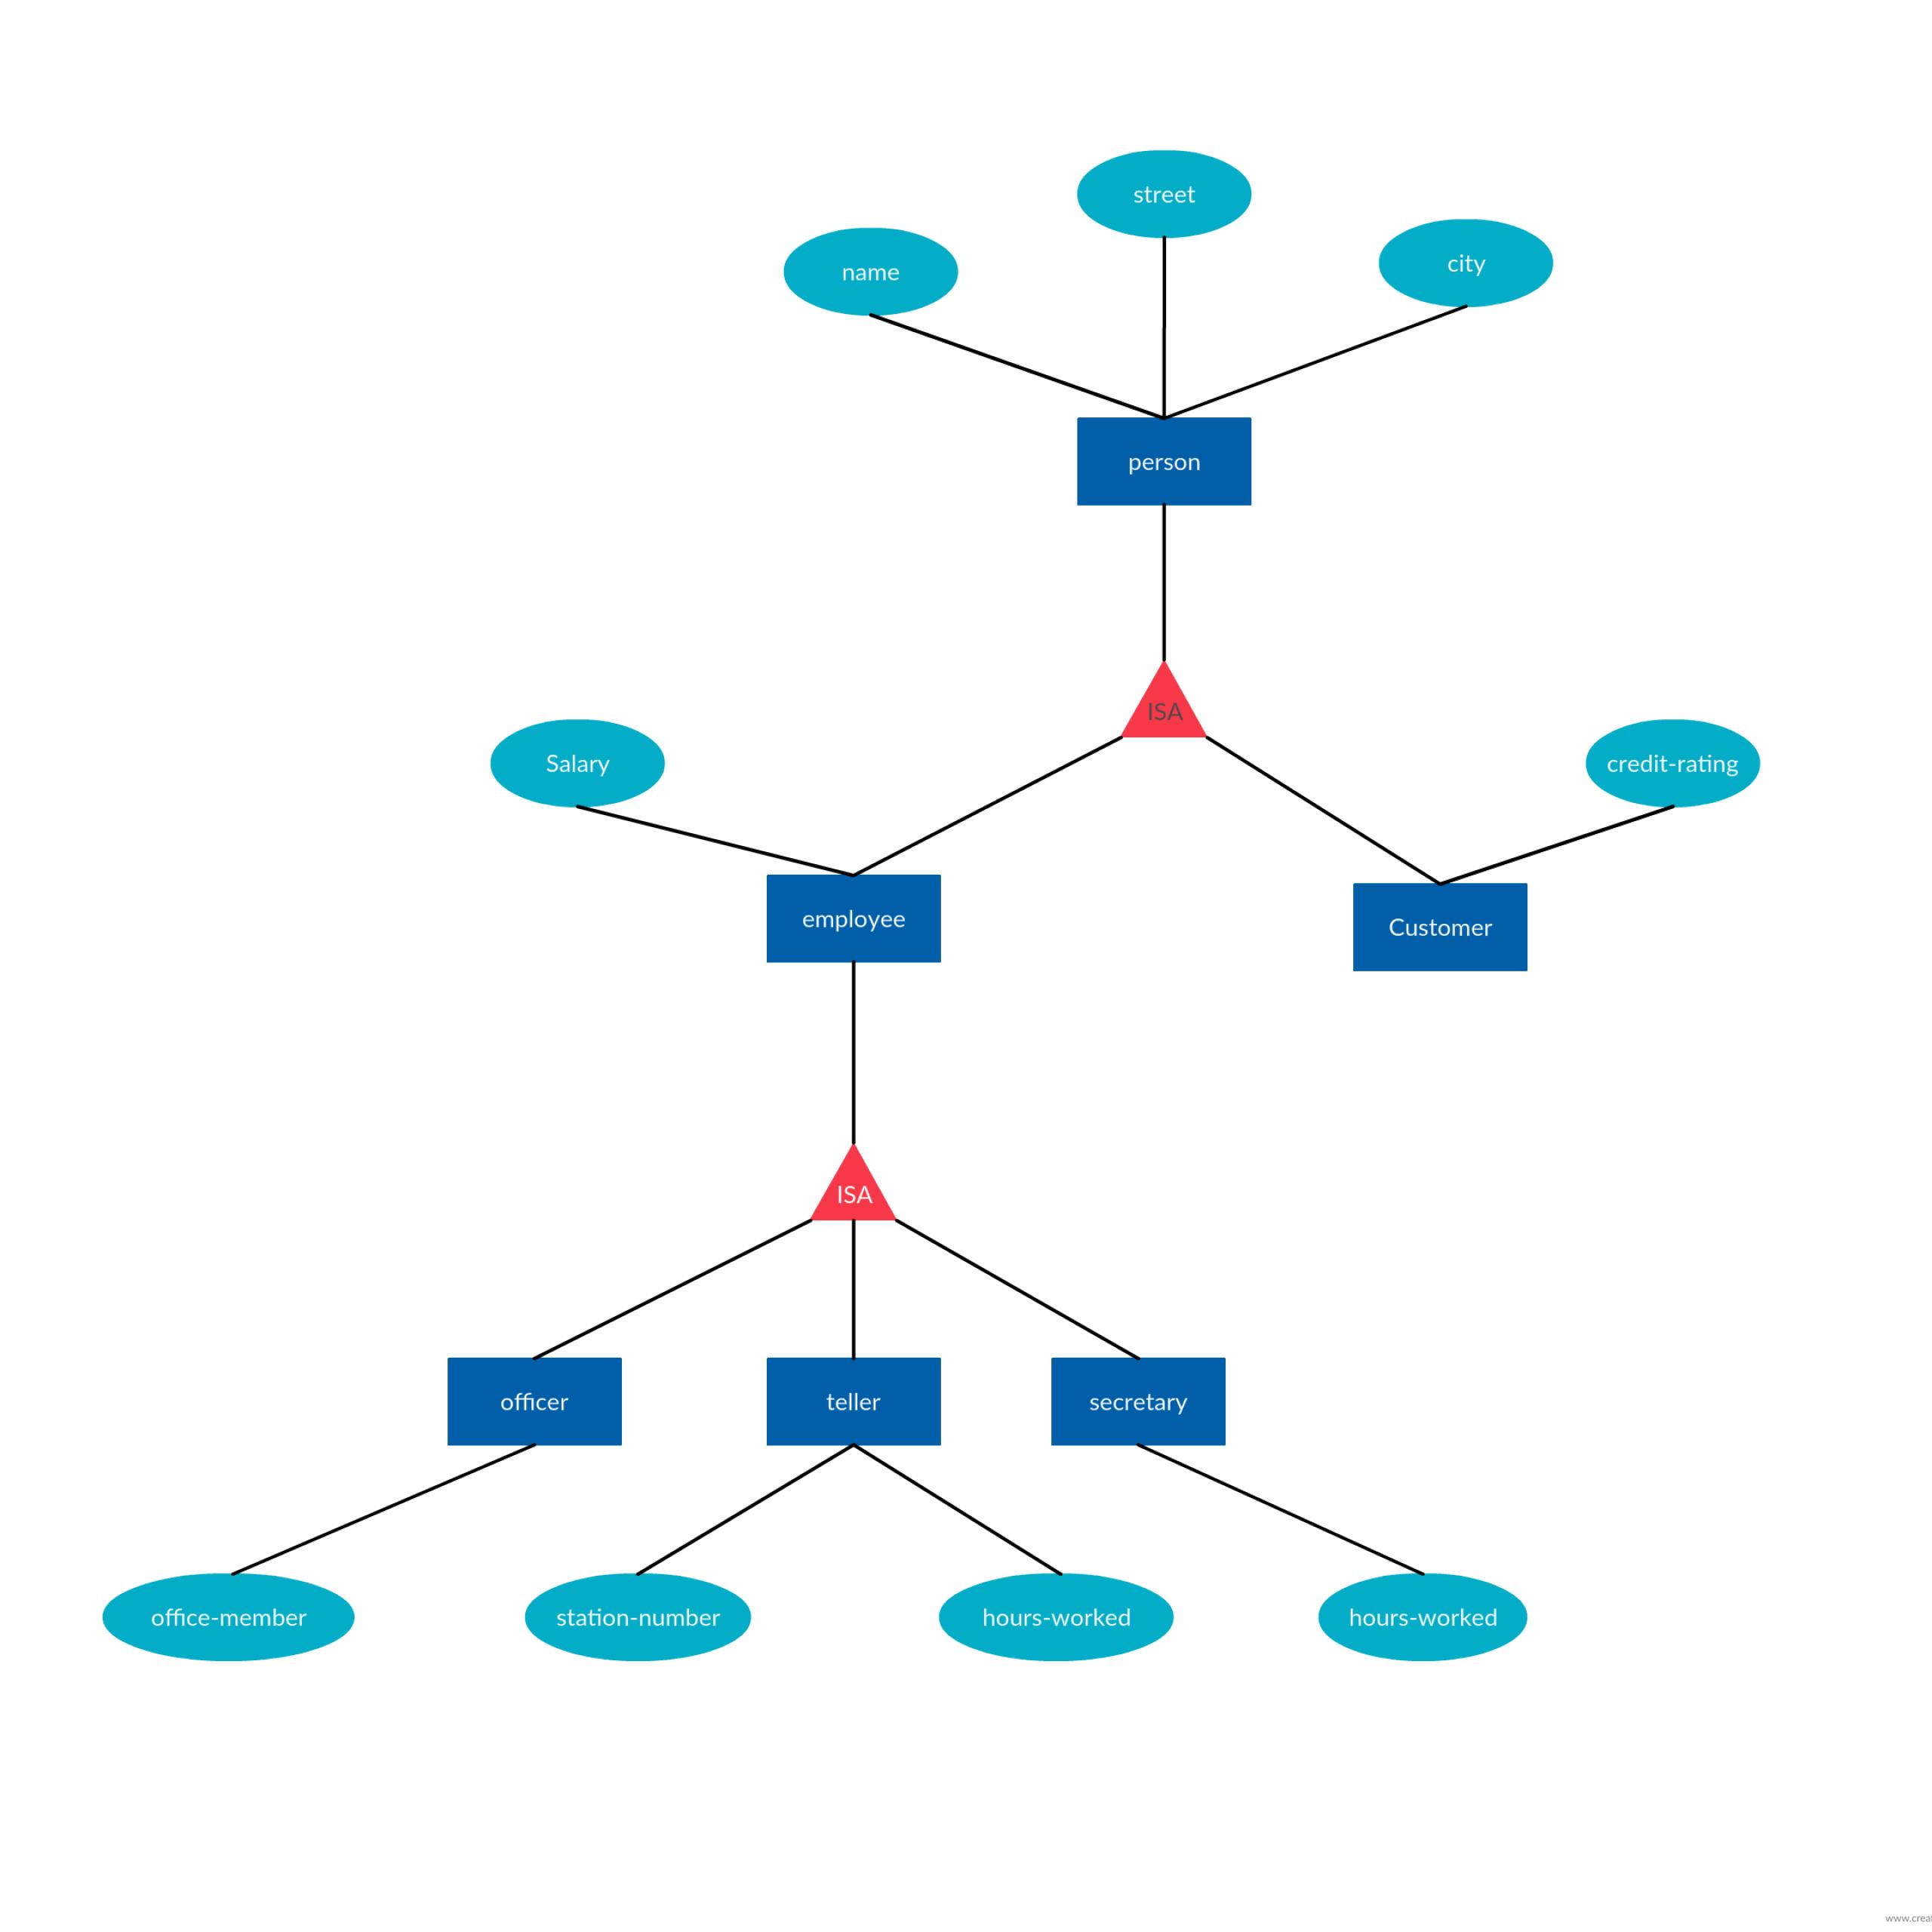 Er Diagram Tutorial | Diagram, Relationship, Templates within Er Diagram Isa Relationship